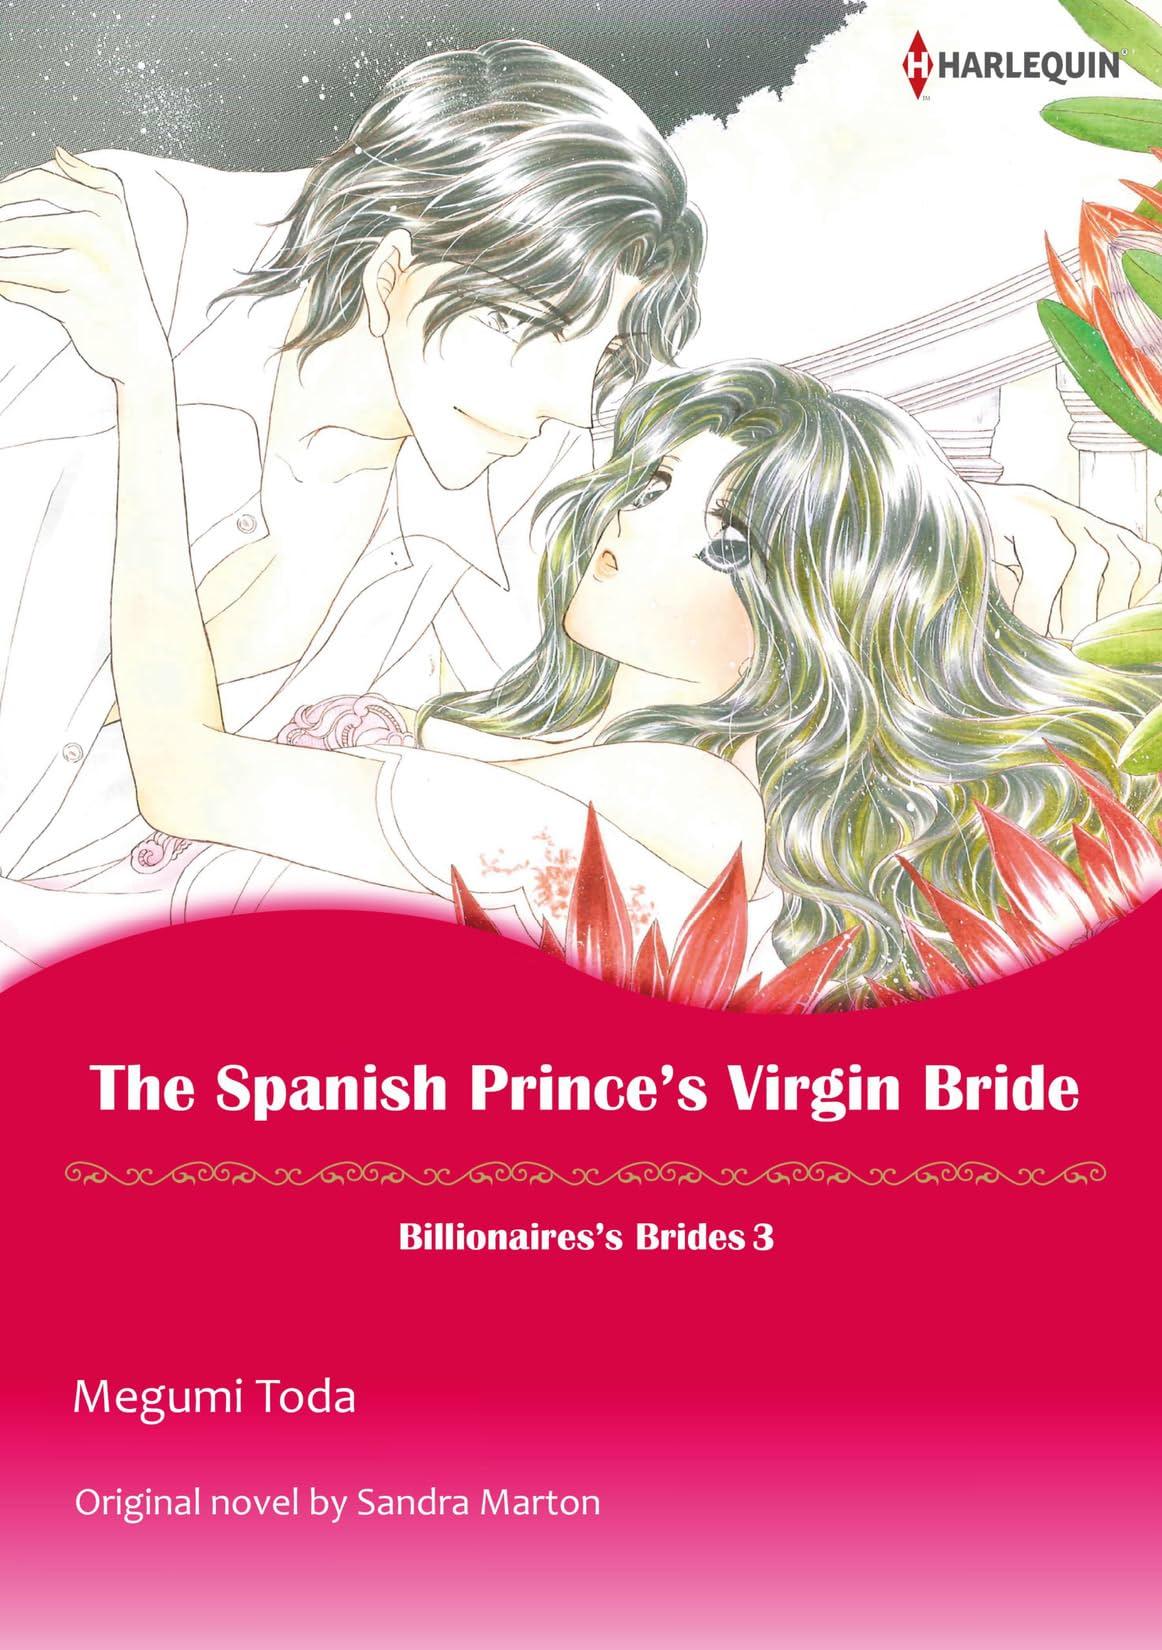 The Spanish Prince's Virgin Bride